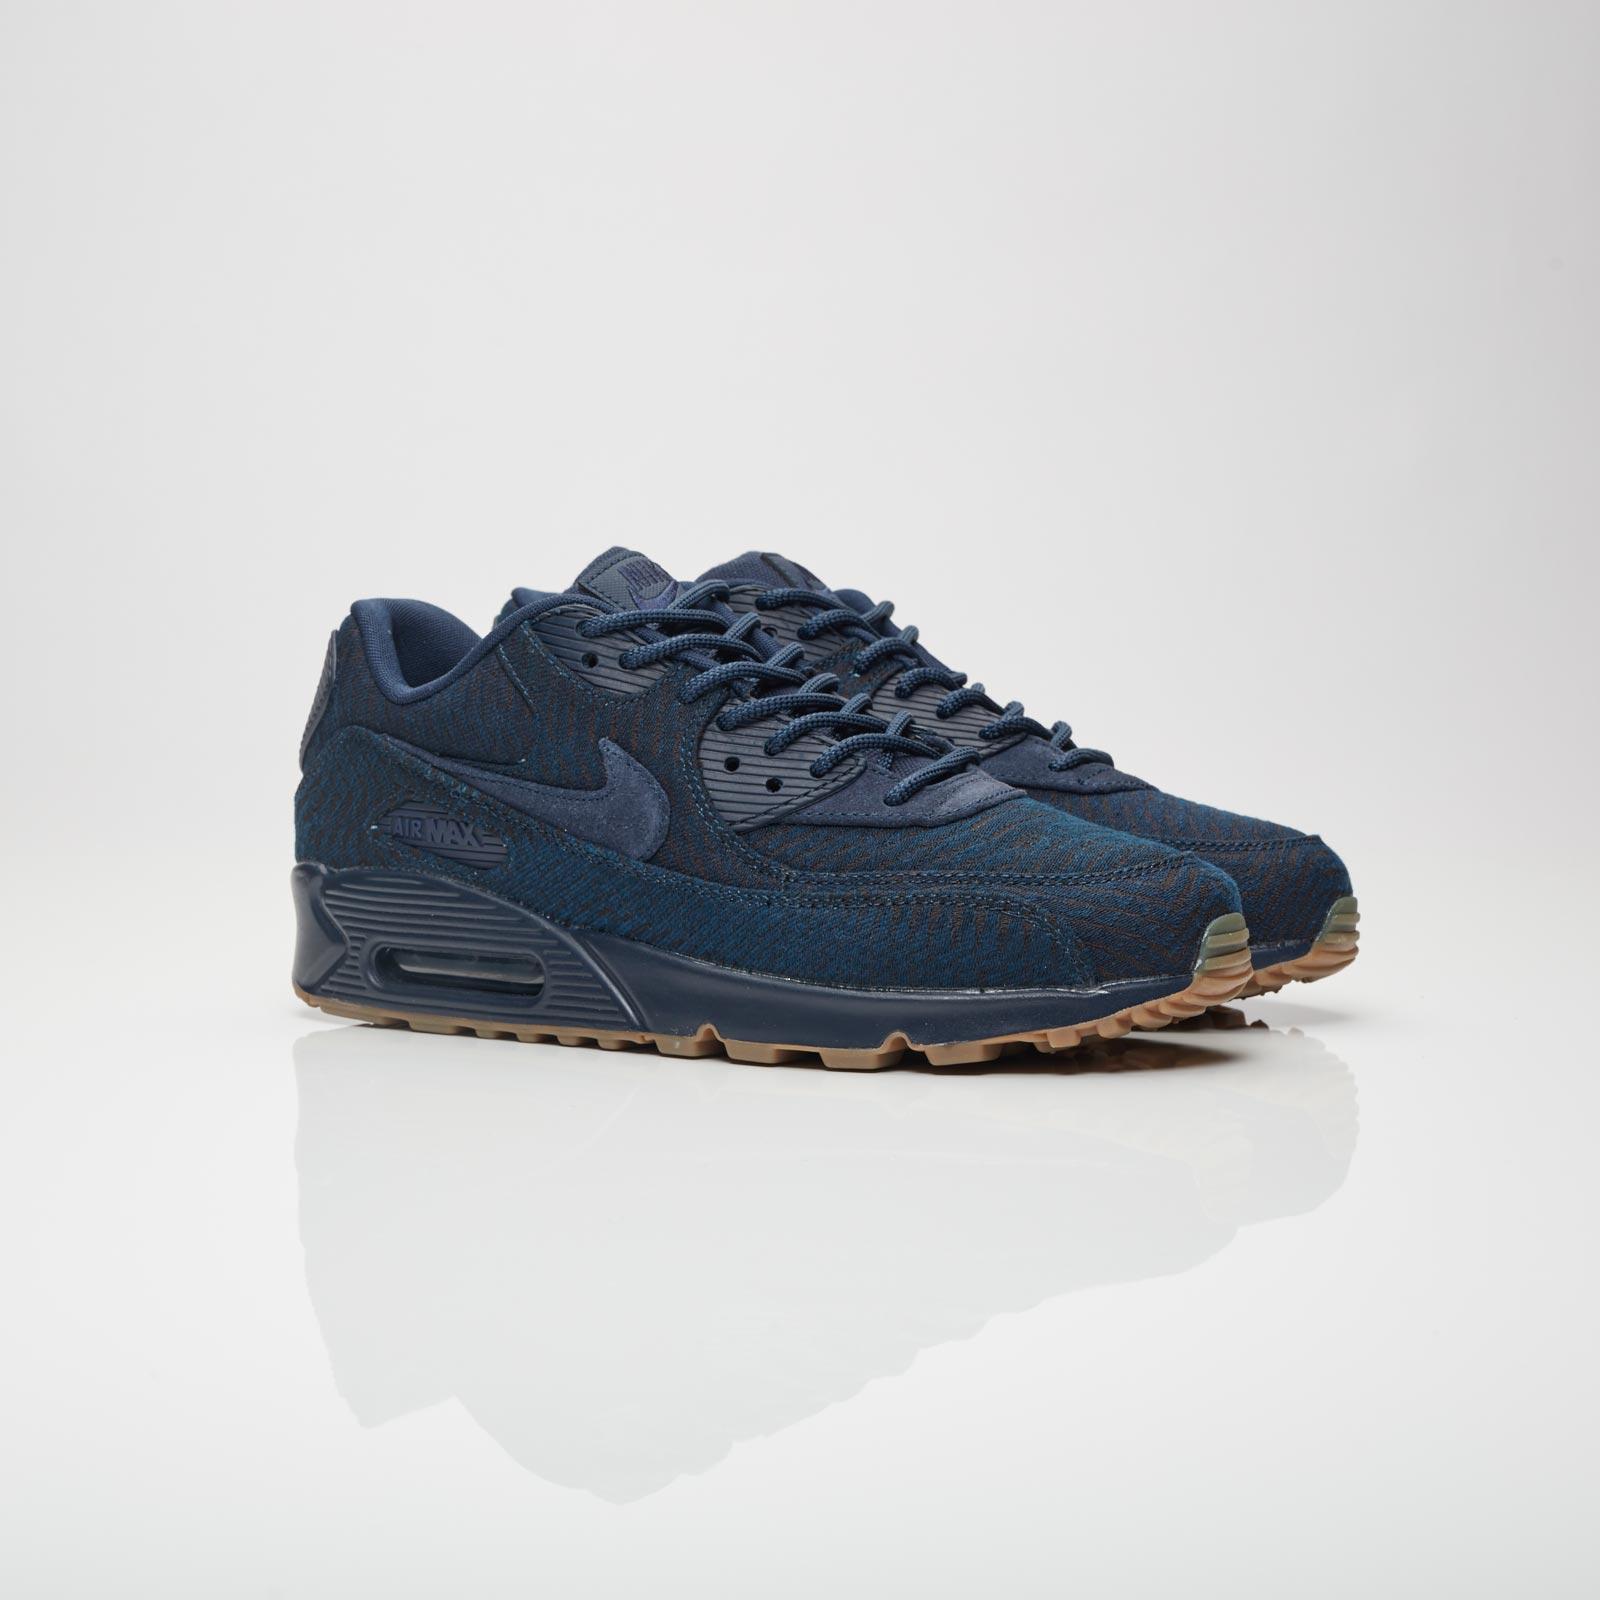 Nike Air Max 90 Premium JCRD - 918358